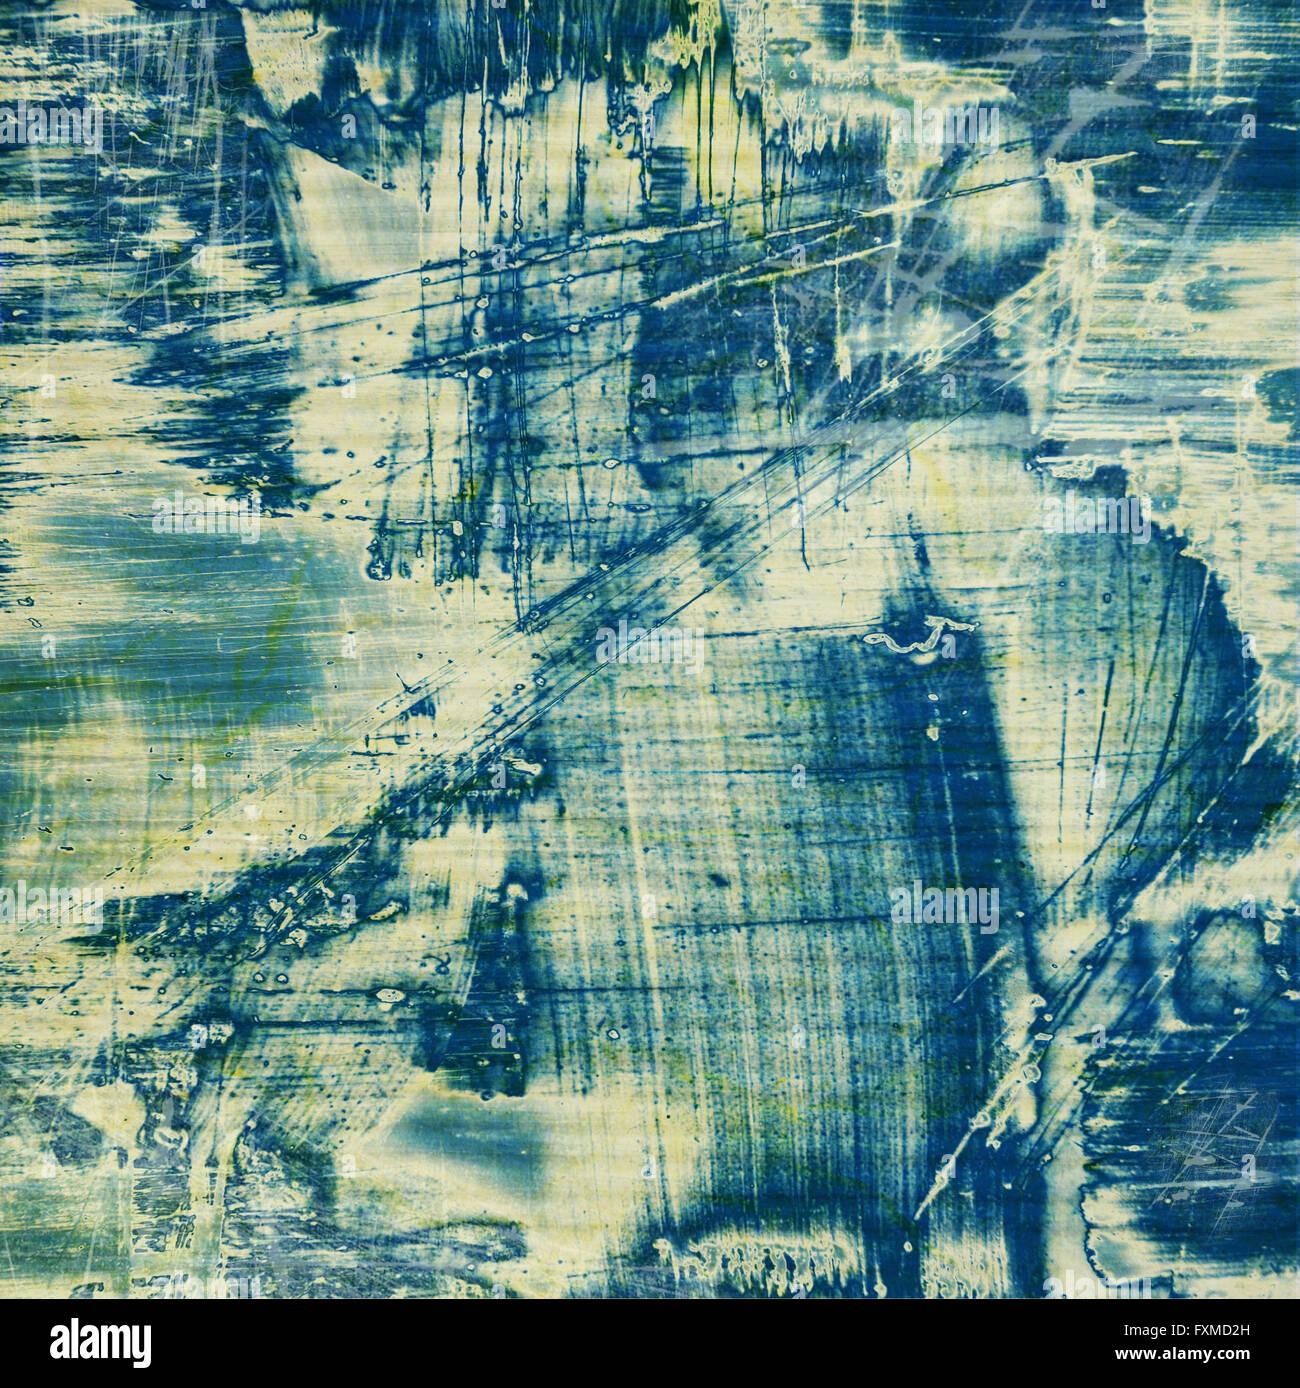 Designed grunge texture paint background For vintage wallpaper